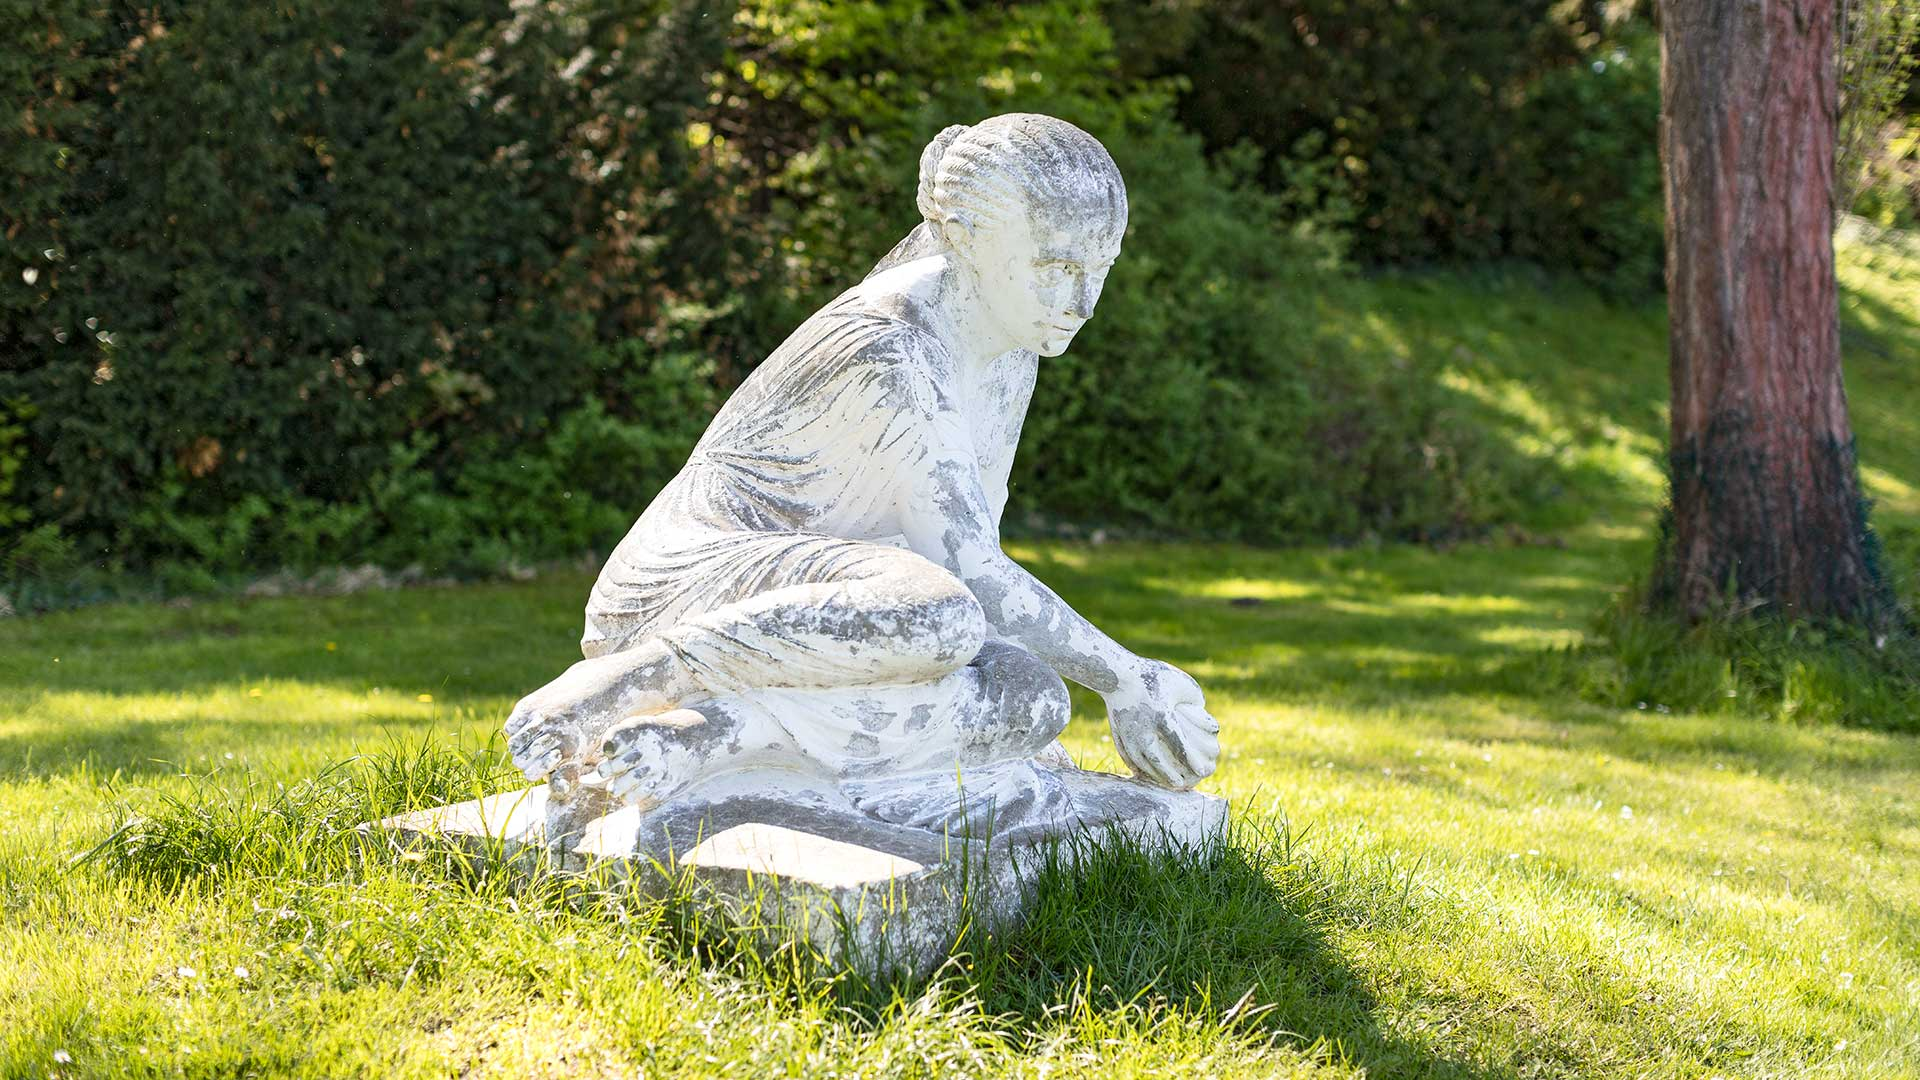 Landschaftsfotografie, Regionalporträt: Wurlitzer Park – Skulptur | Foto: Dieter Eikenberg, imprints